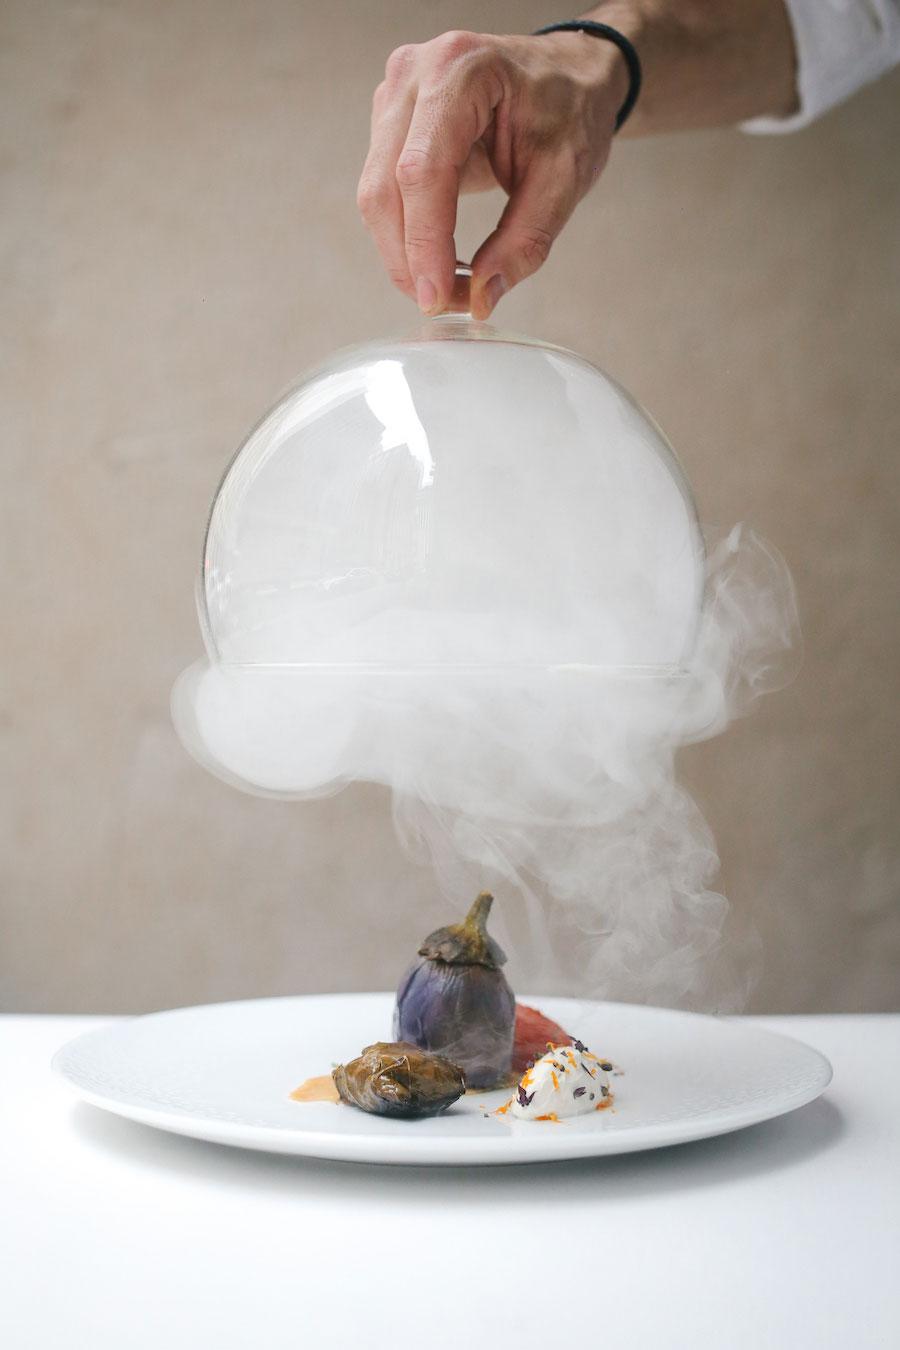 A smoky eggplant dish